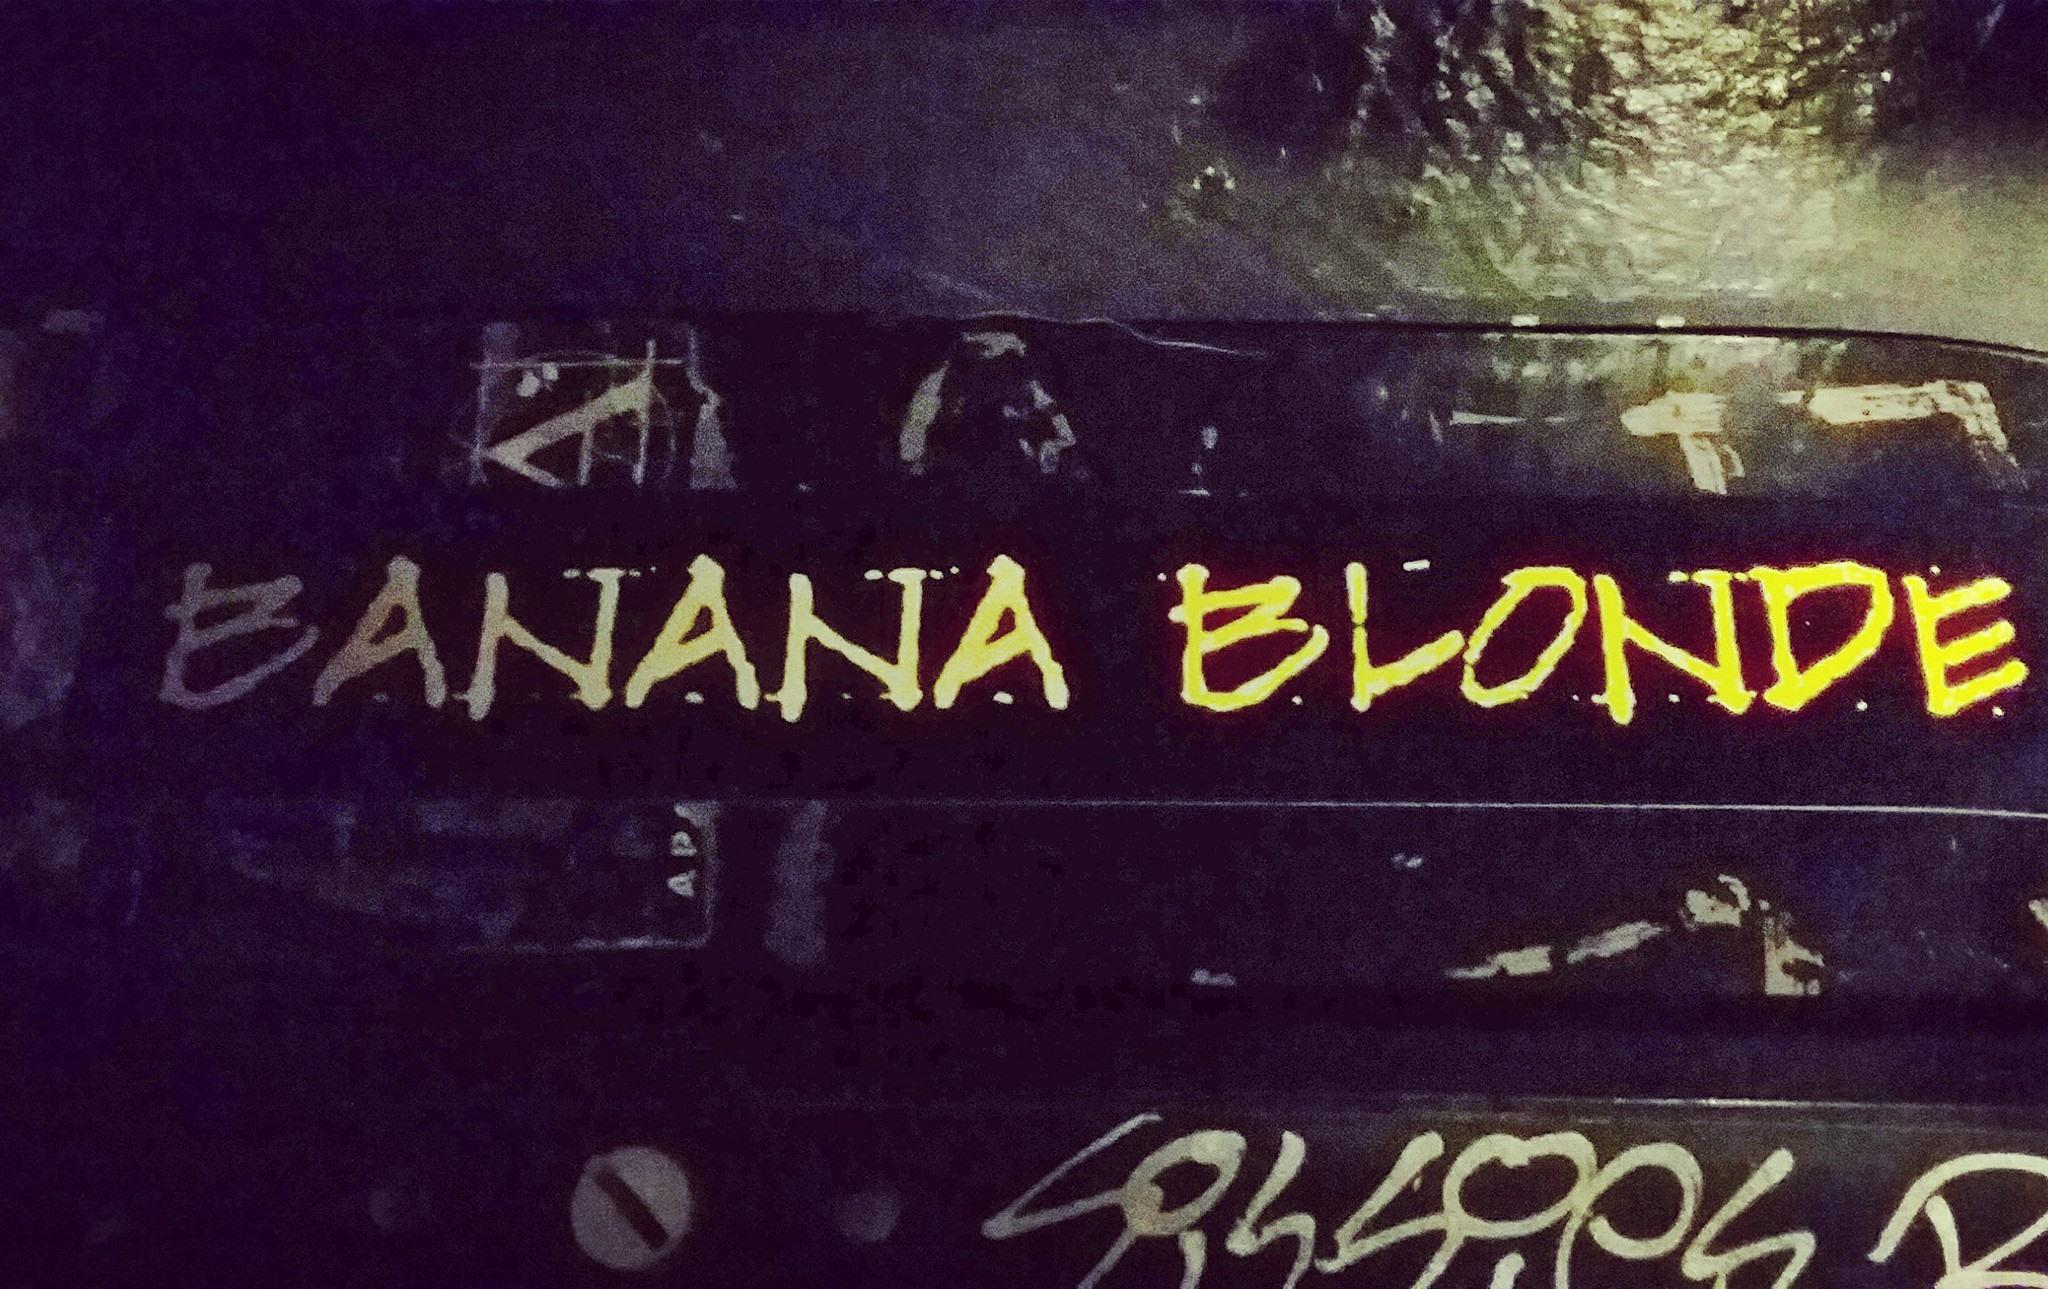 banana blonde